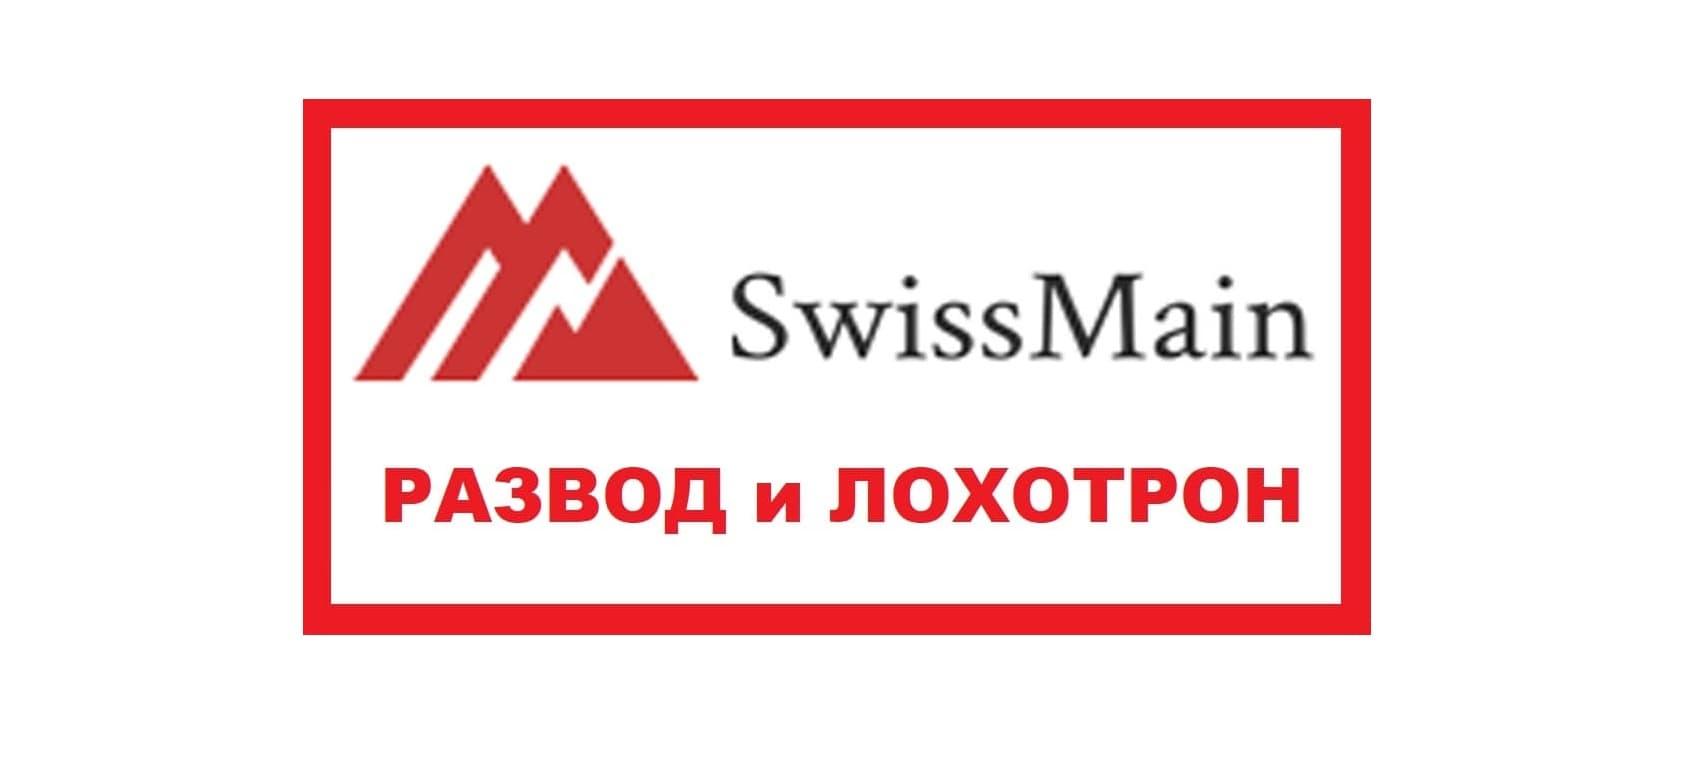 SwissMain развод